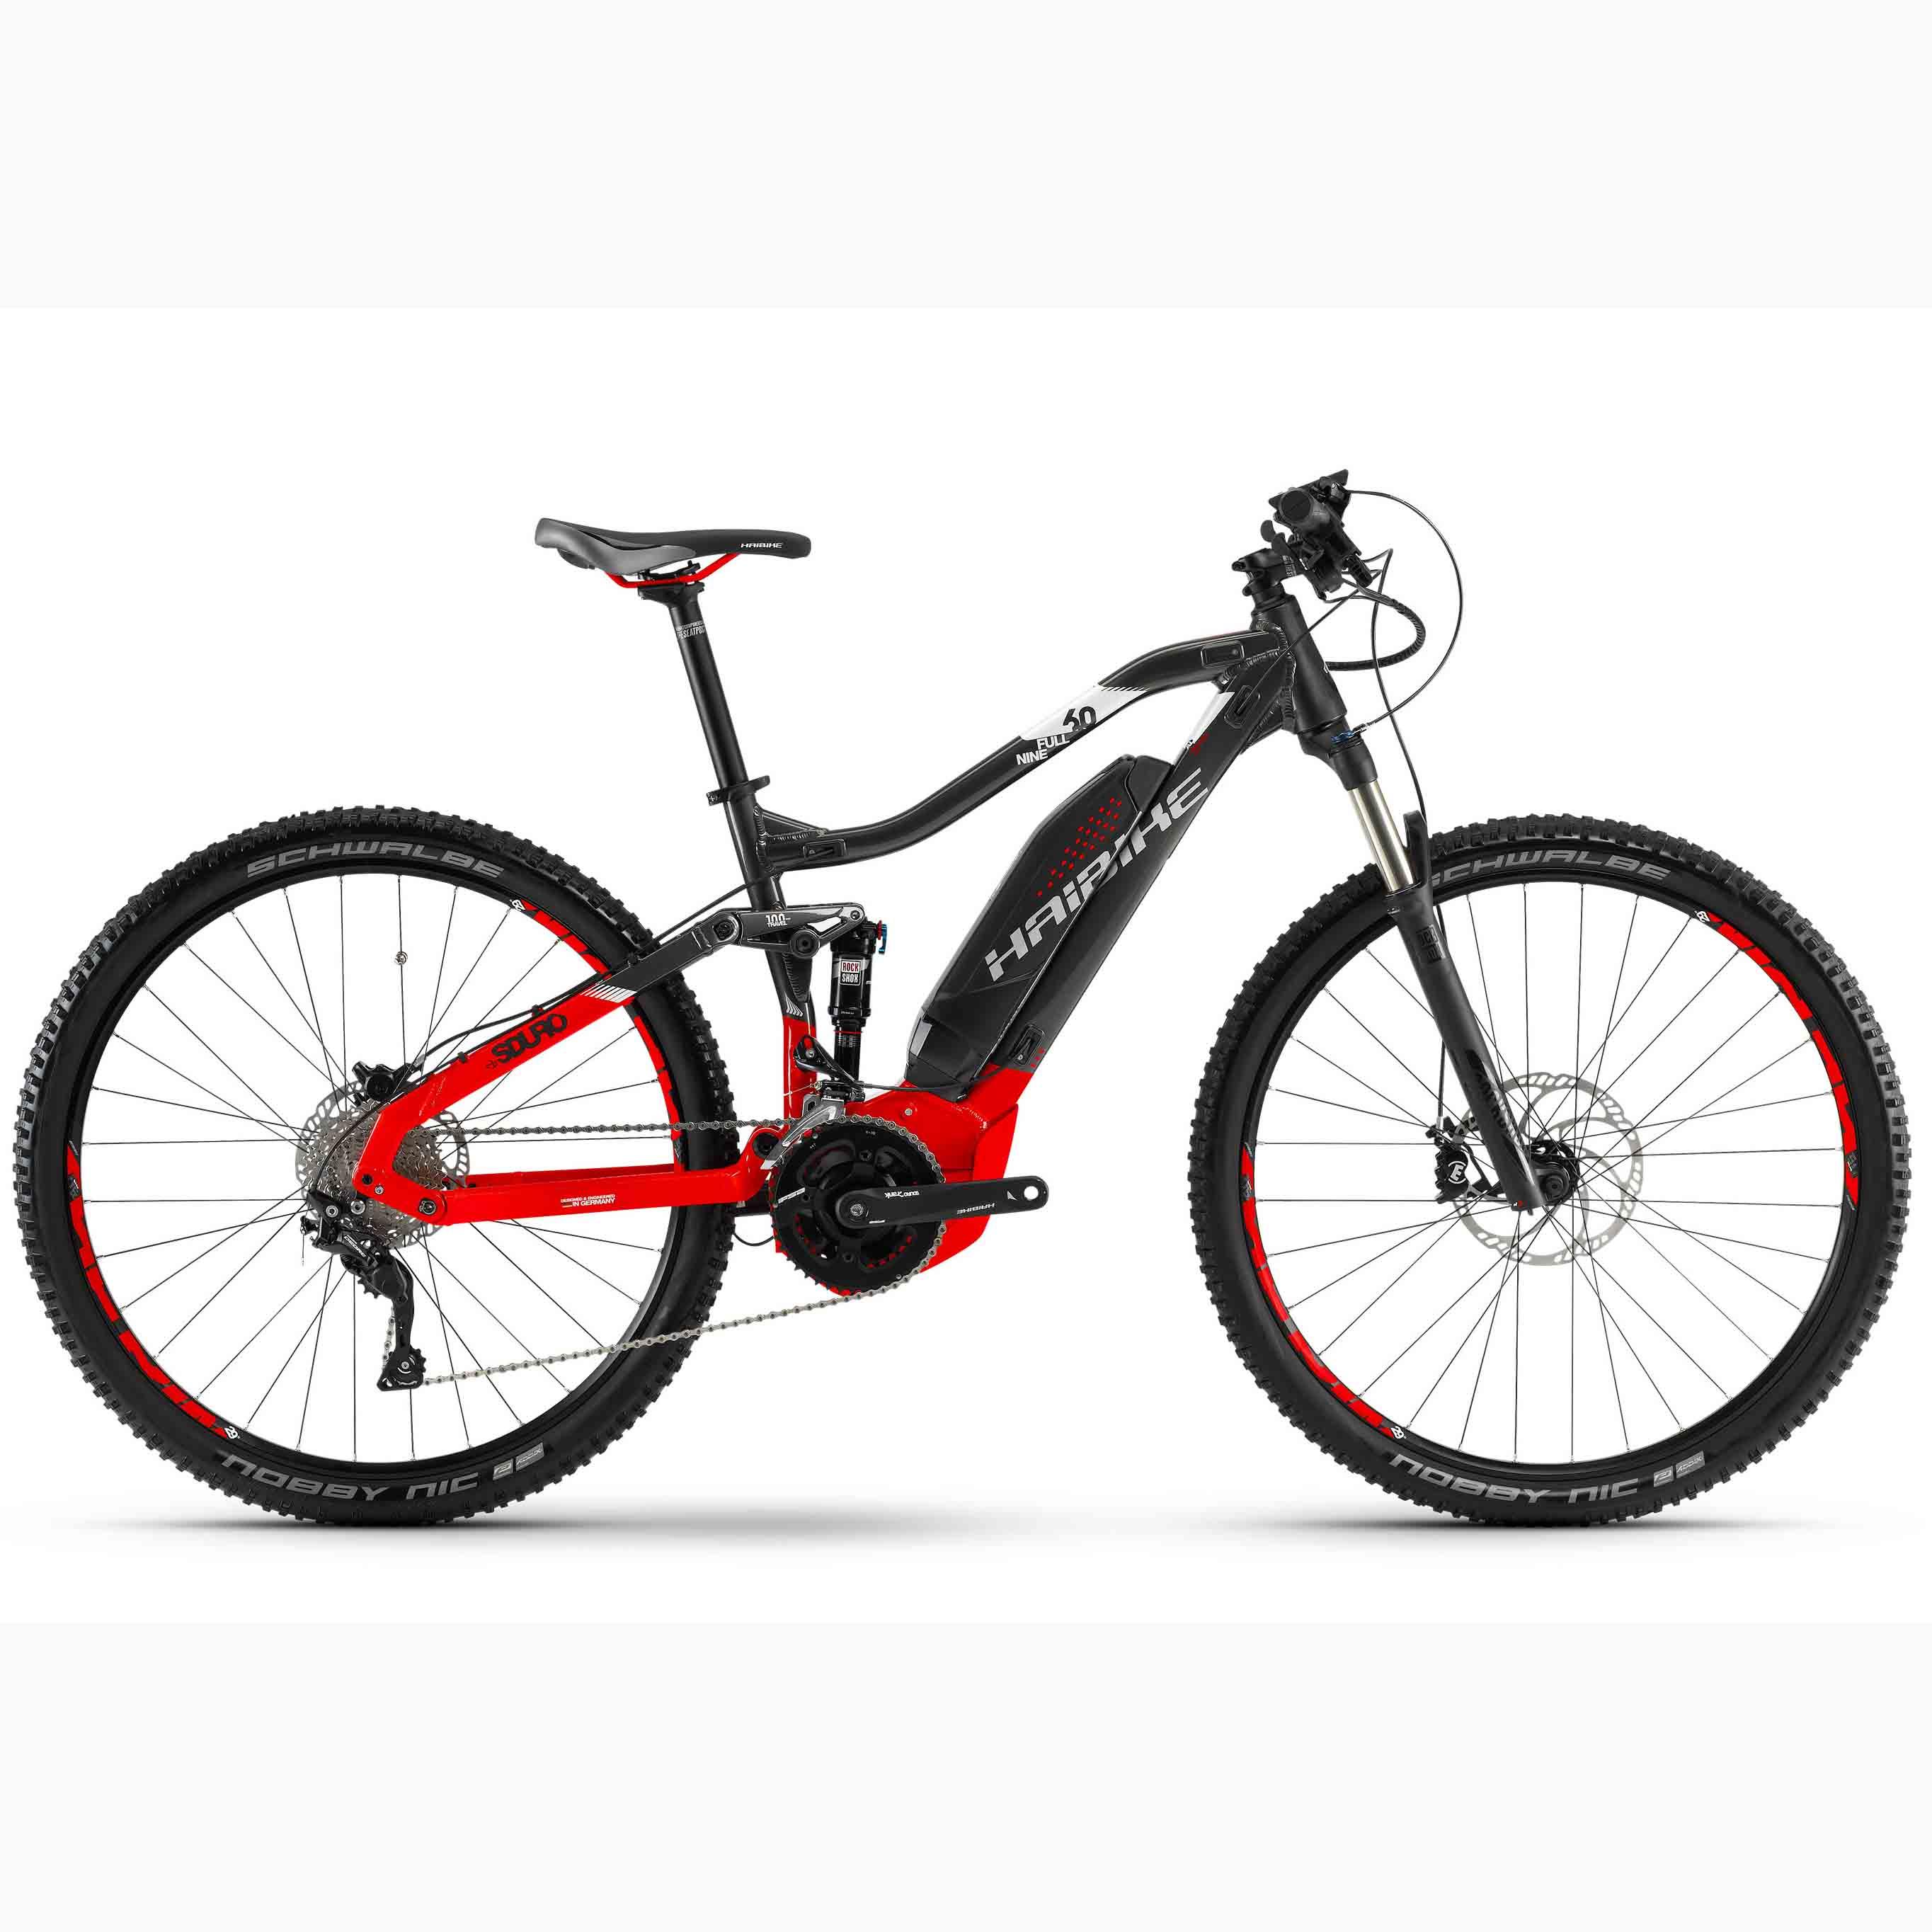 Фото Велосипед Haibike SDURO FullNine 6.0 29″ 500Wh, рама 48см, ход:100мм, 2018